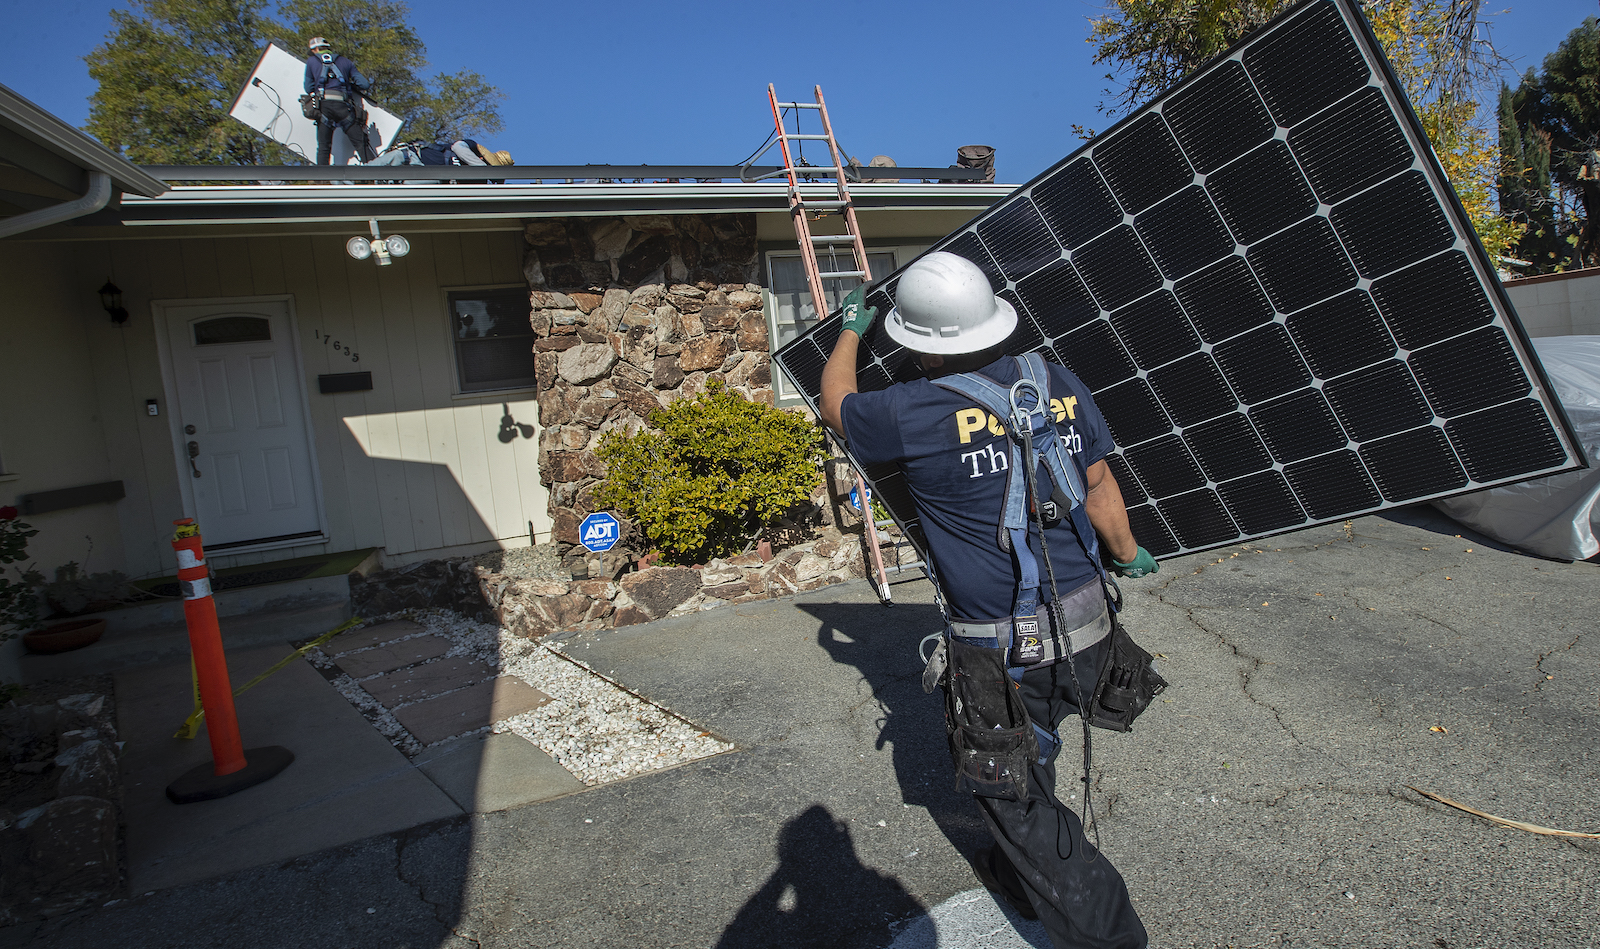 solar panel installer carries a solar panel toward a house